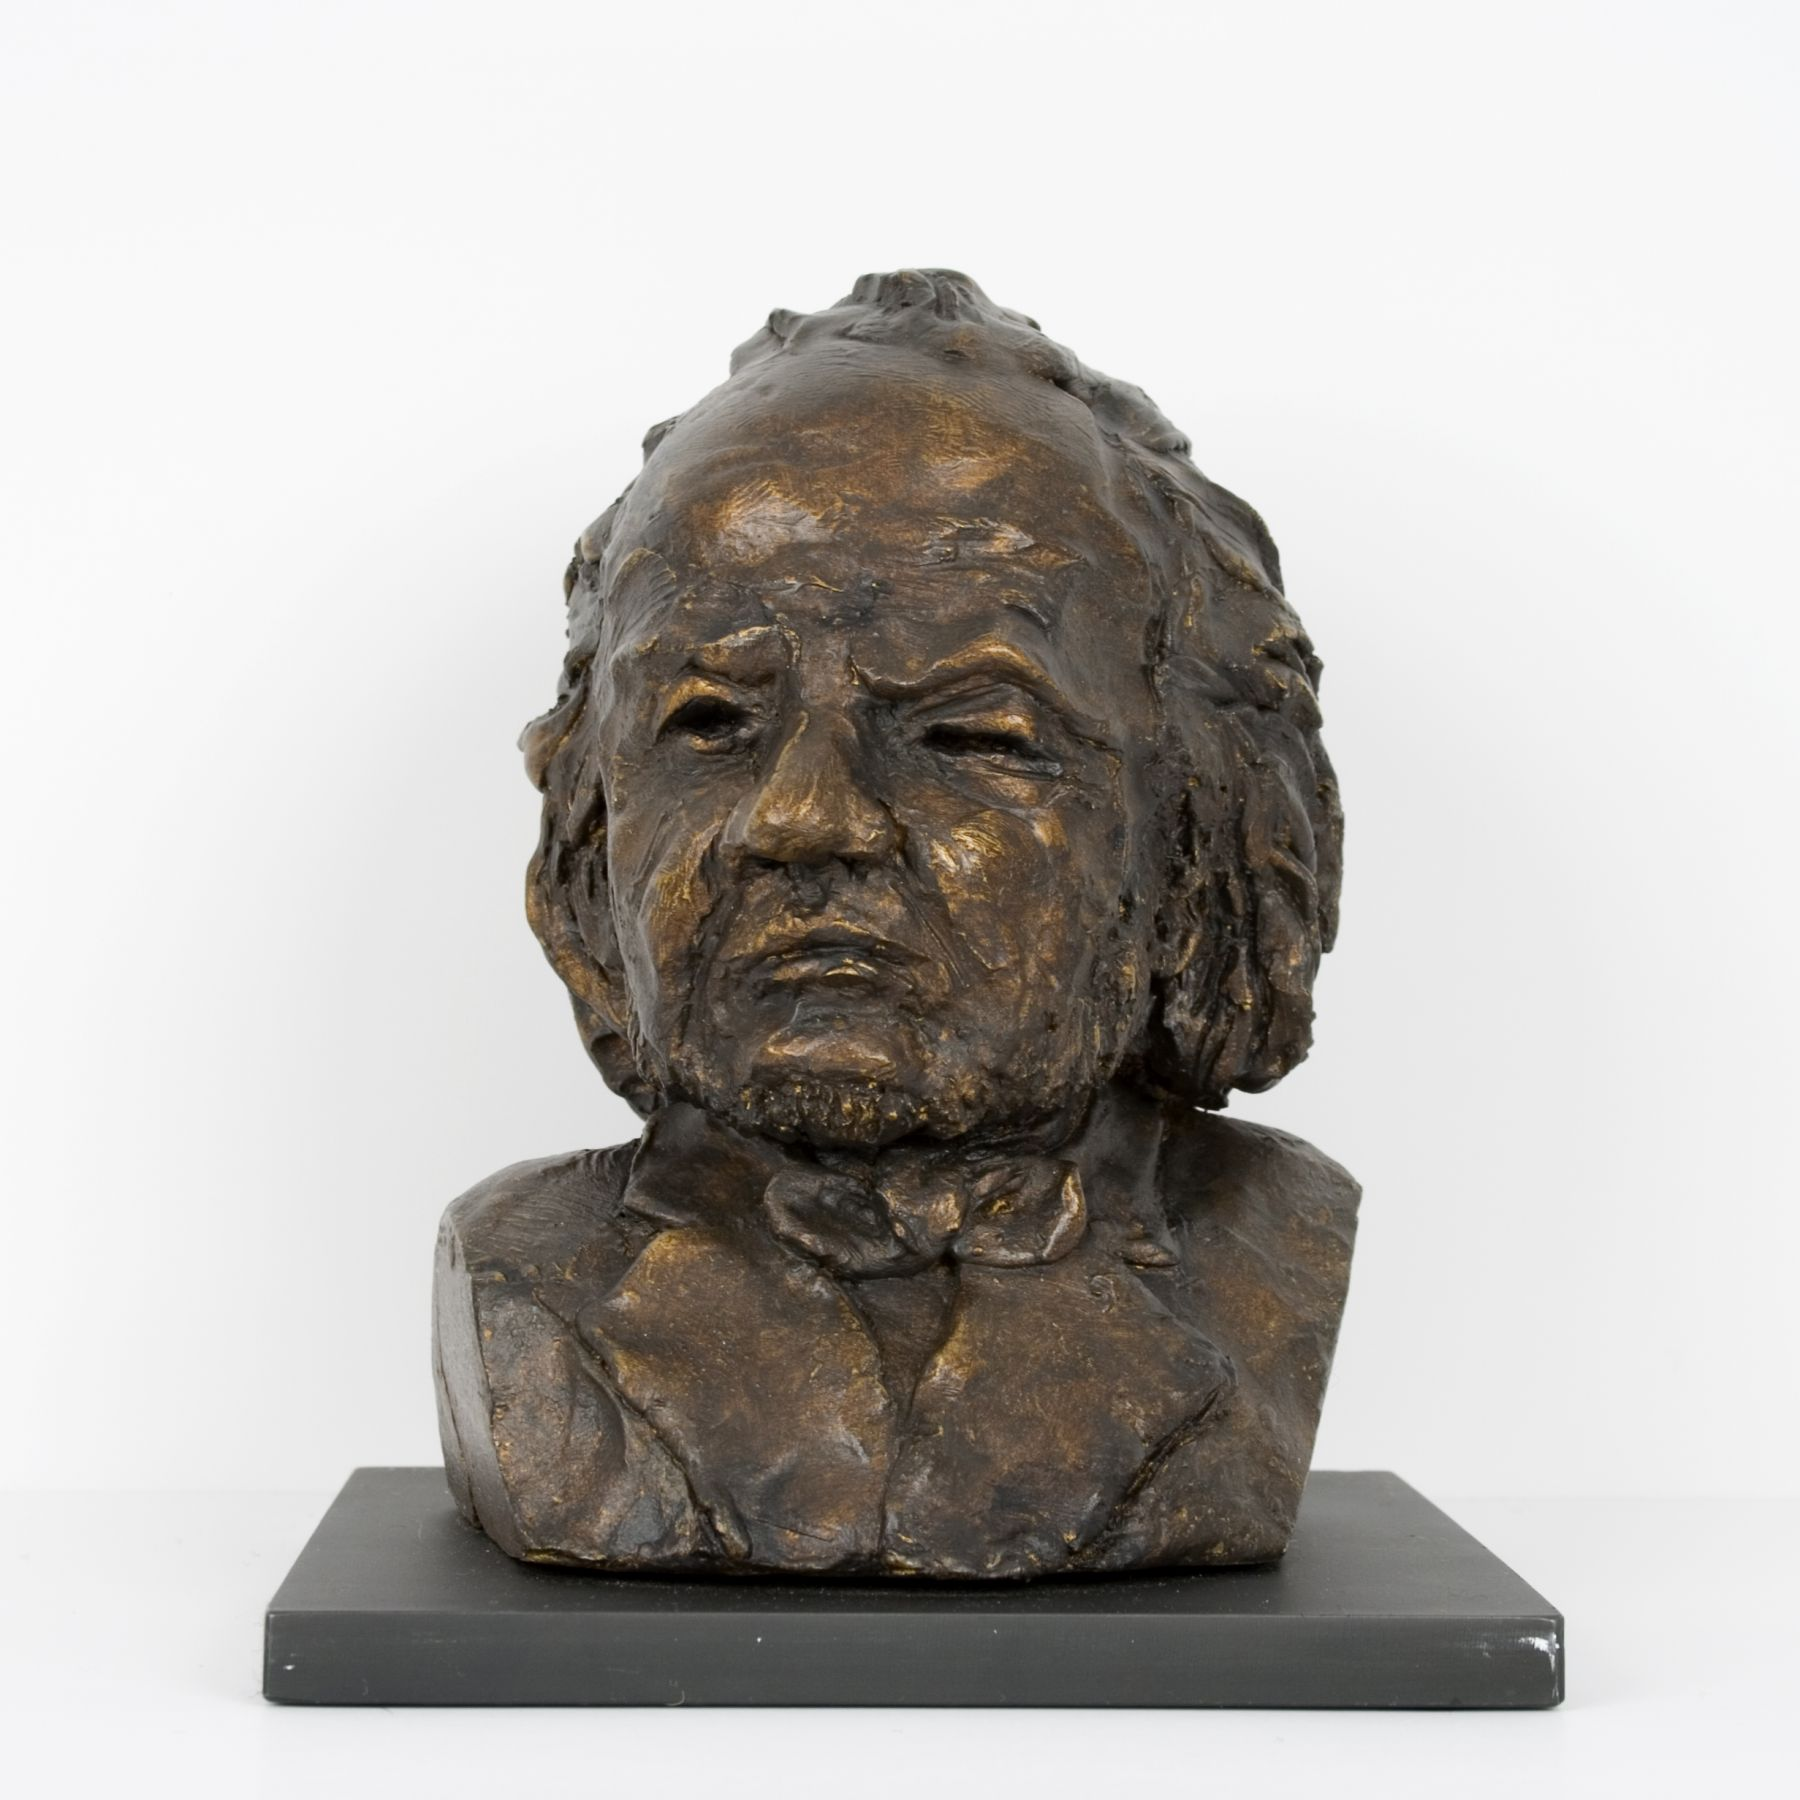 Al Farrow, Portrait of Honoré Daumier, 2018, epoxy clay on steel base, 8 x 5 3/4 x 6 1/4 inches